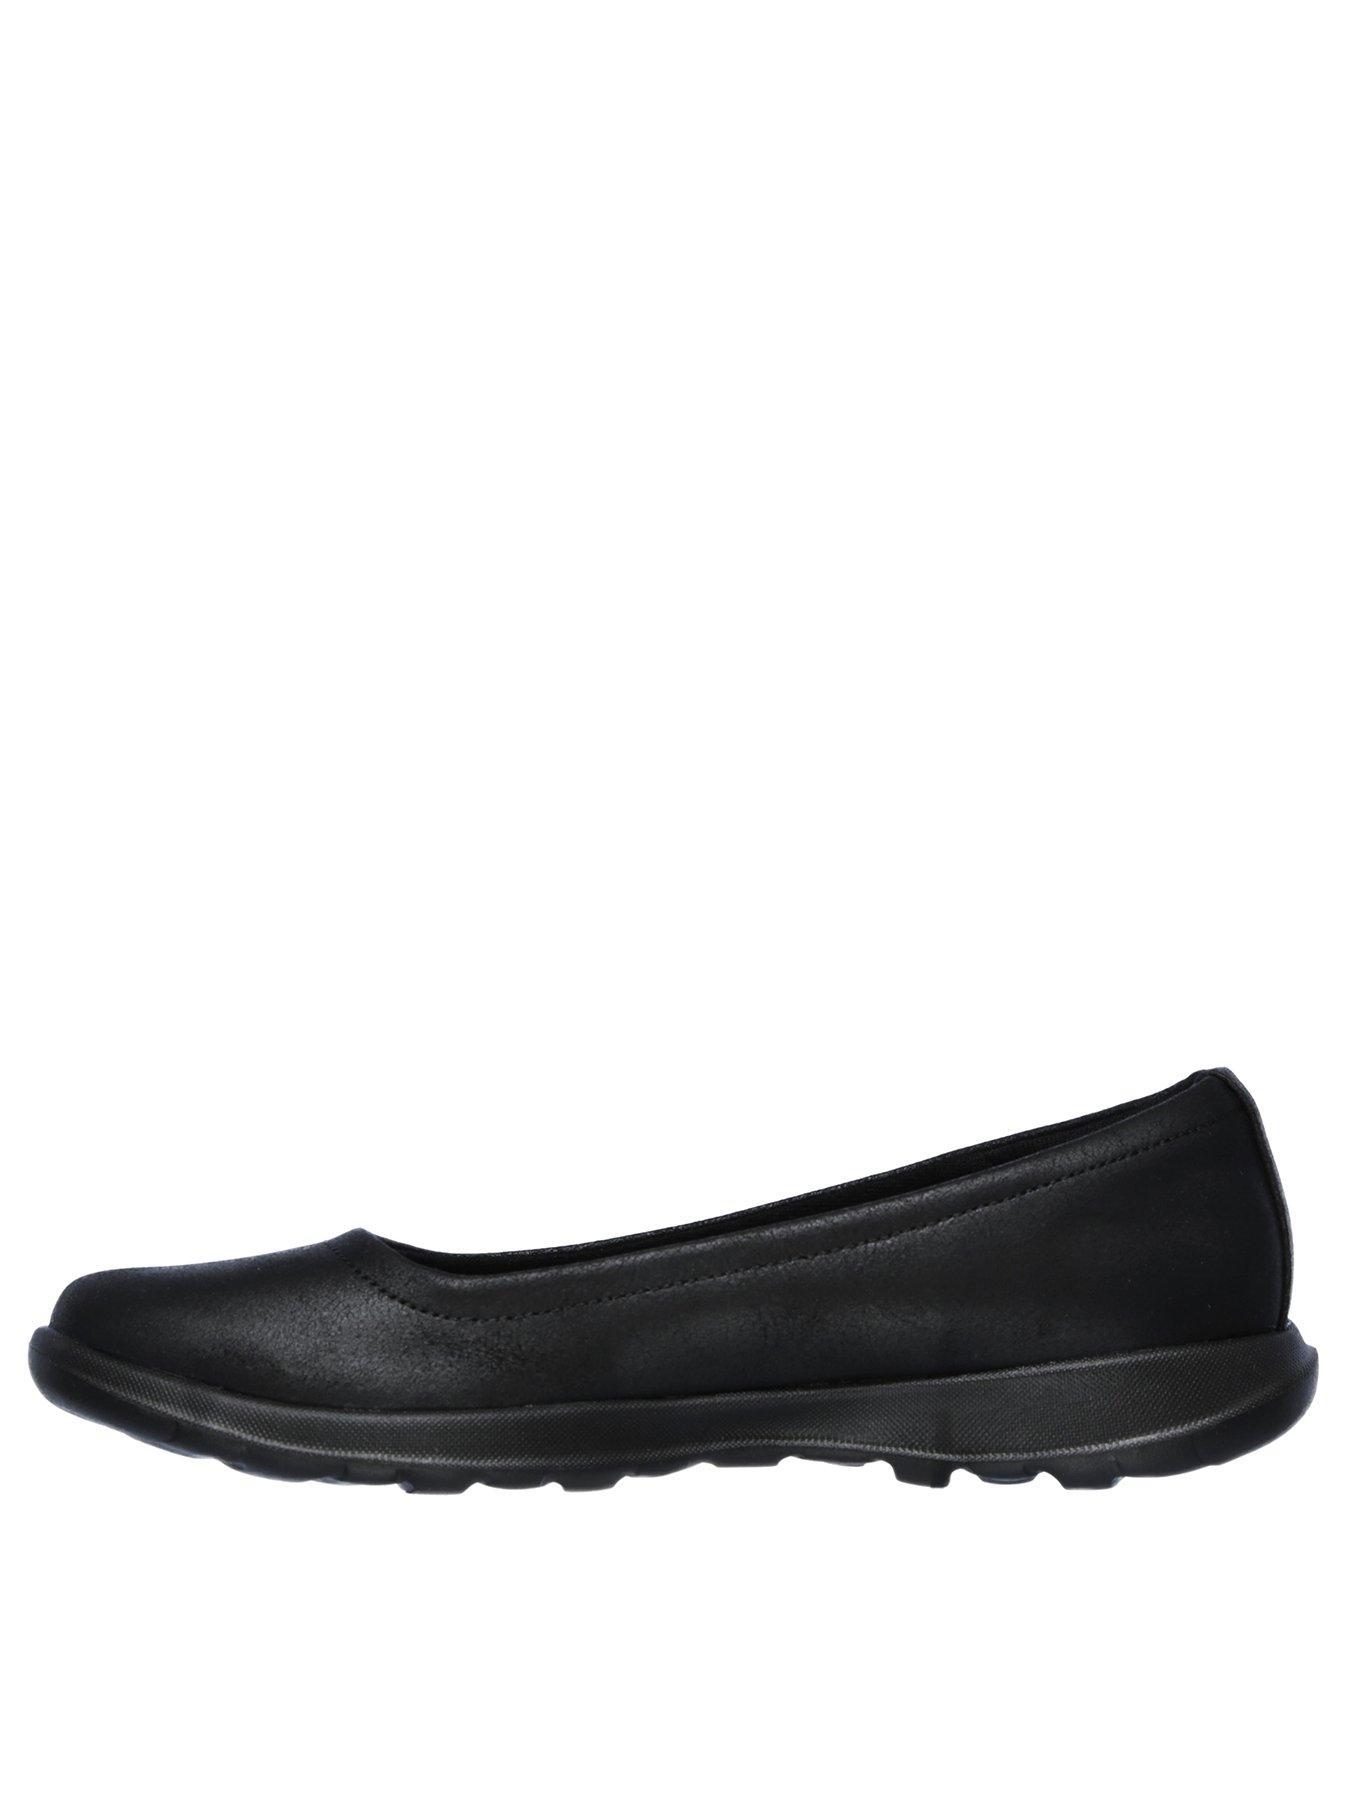 zapatos skechers en amazon 30�